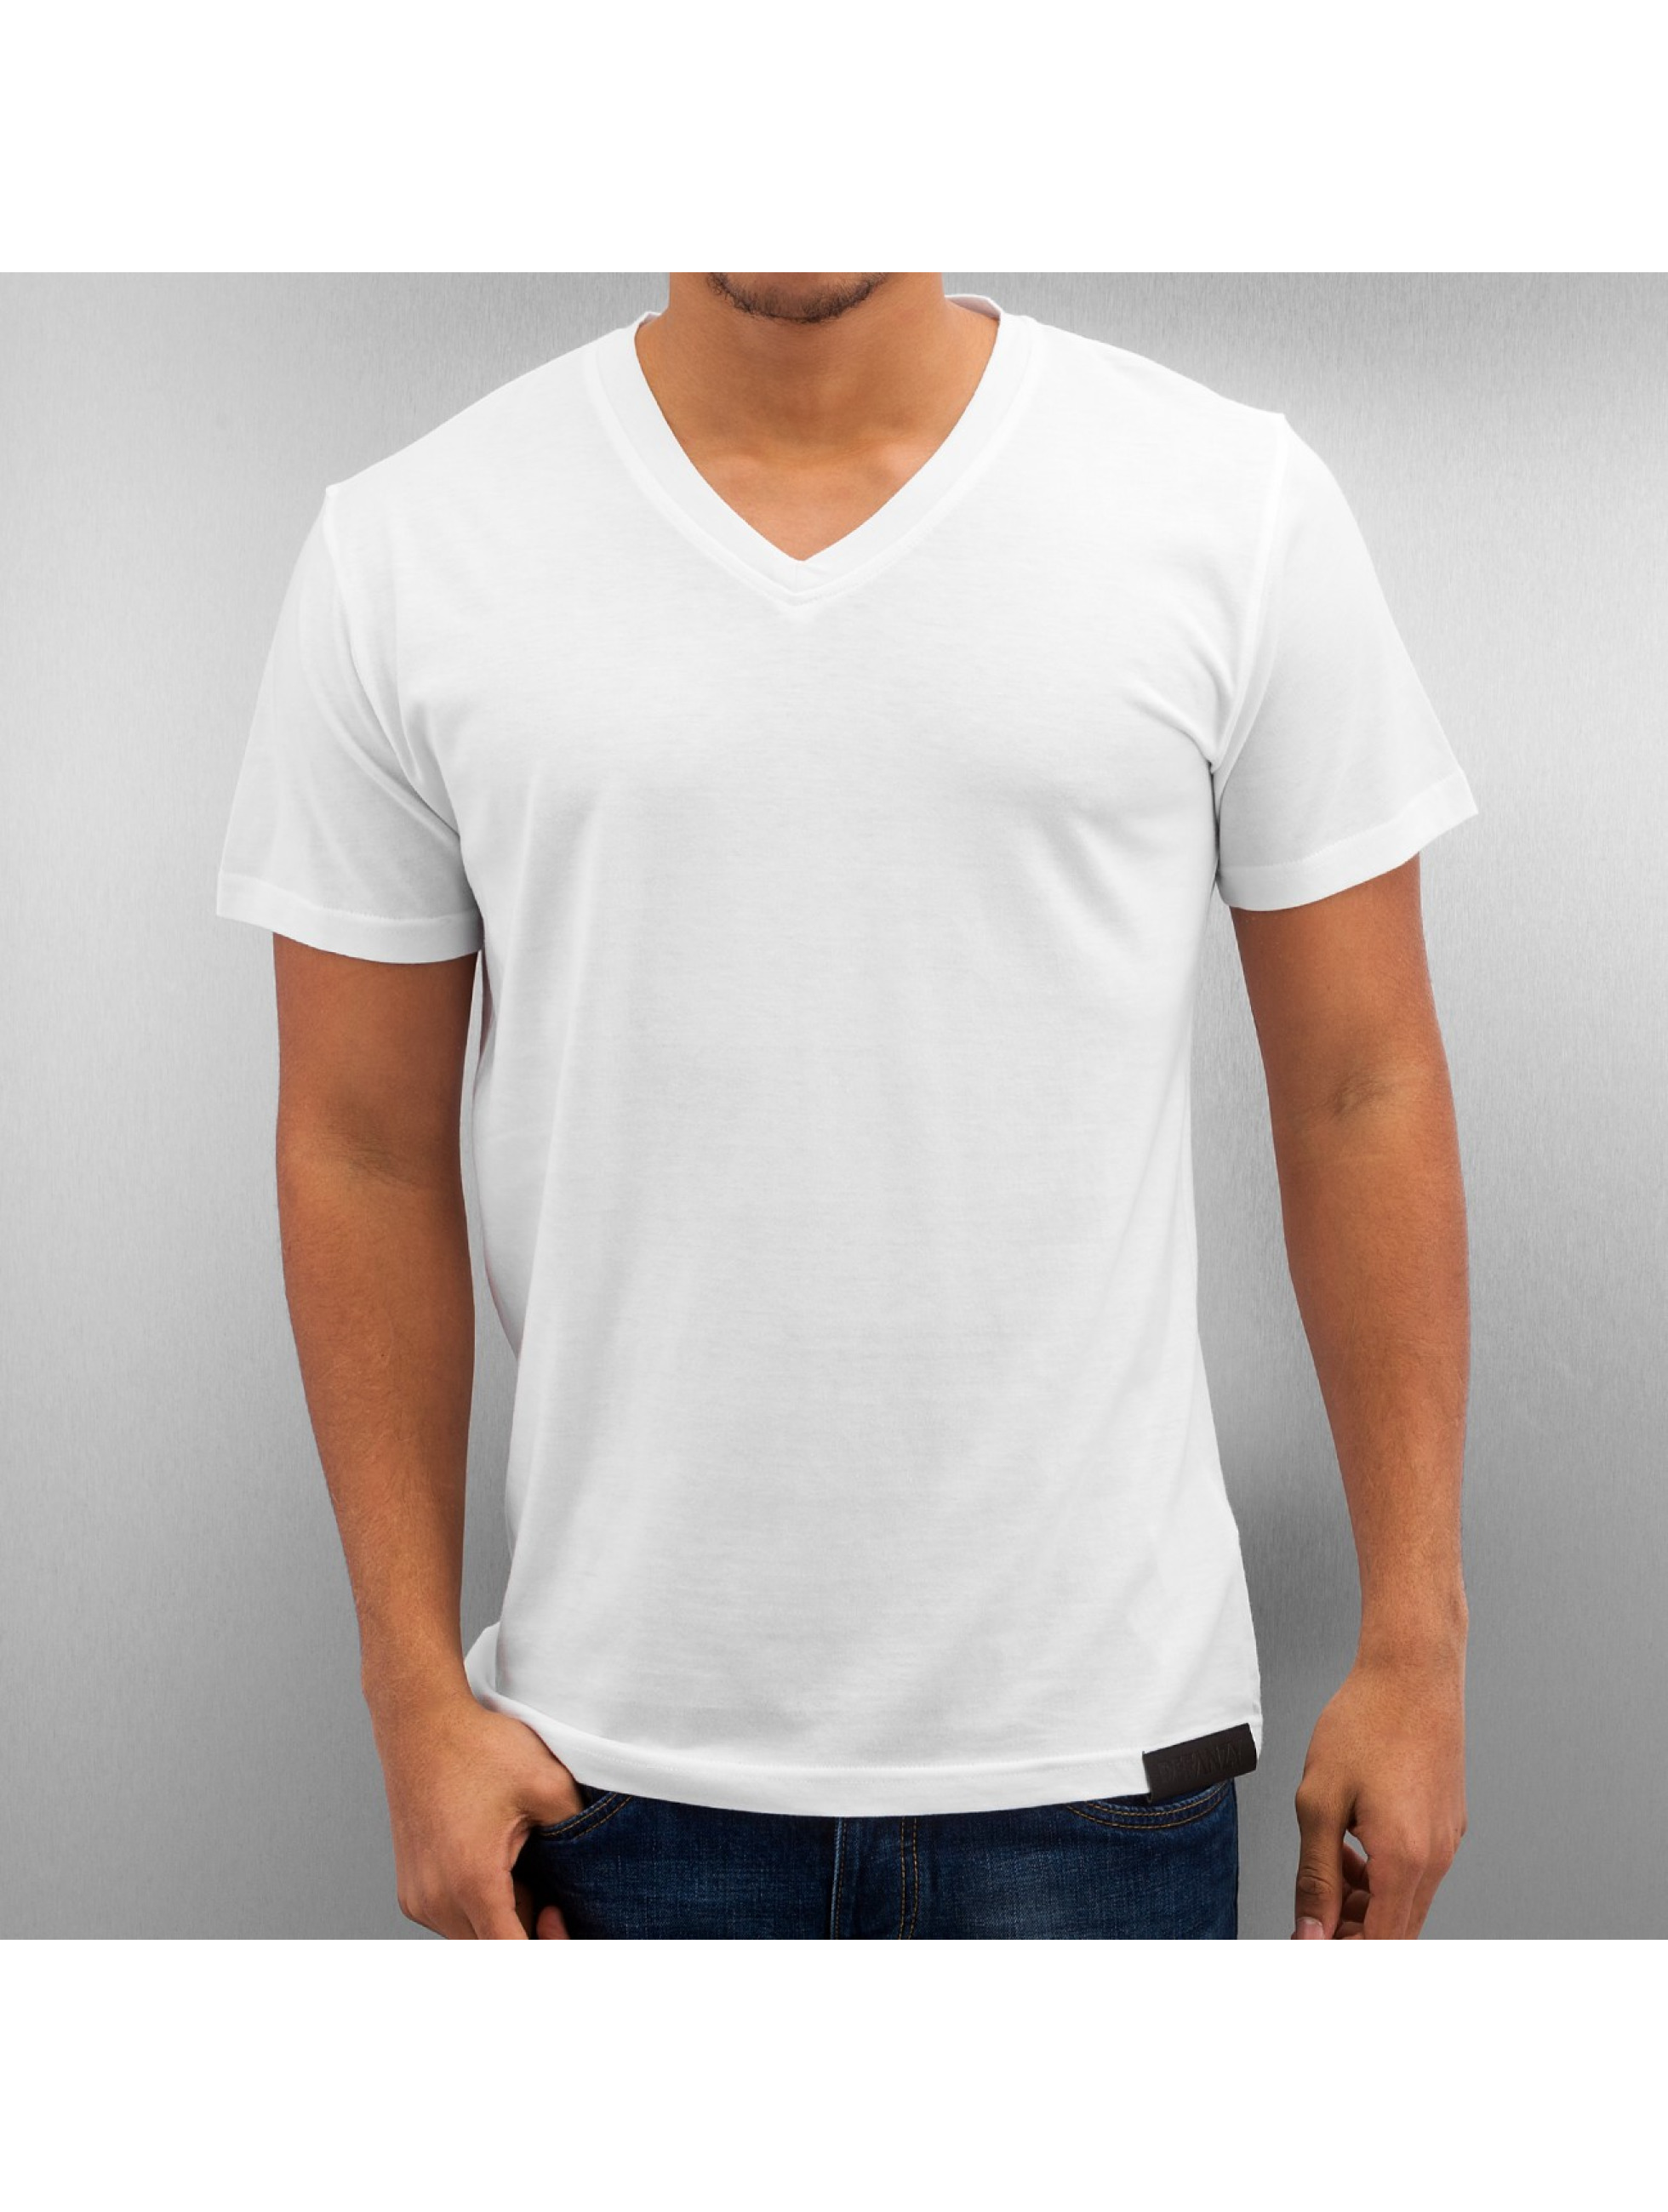 DefShop Männer T-Shirt Basic V-Neck in weiß